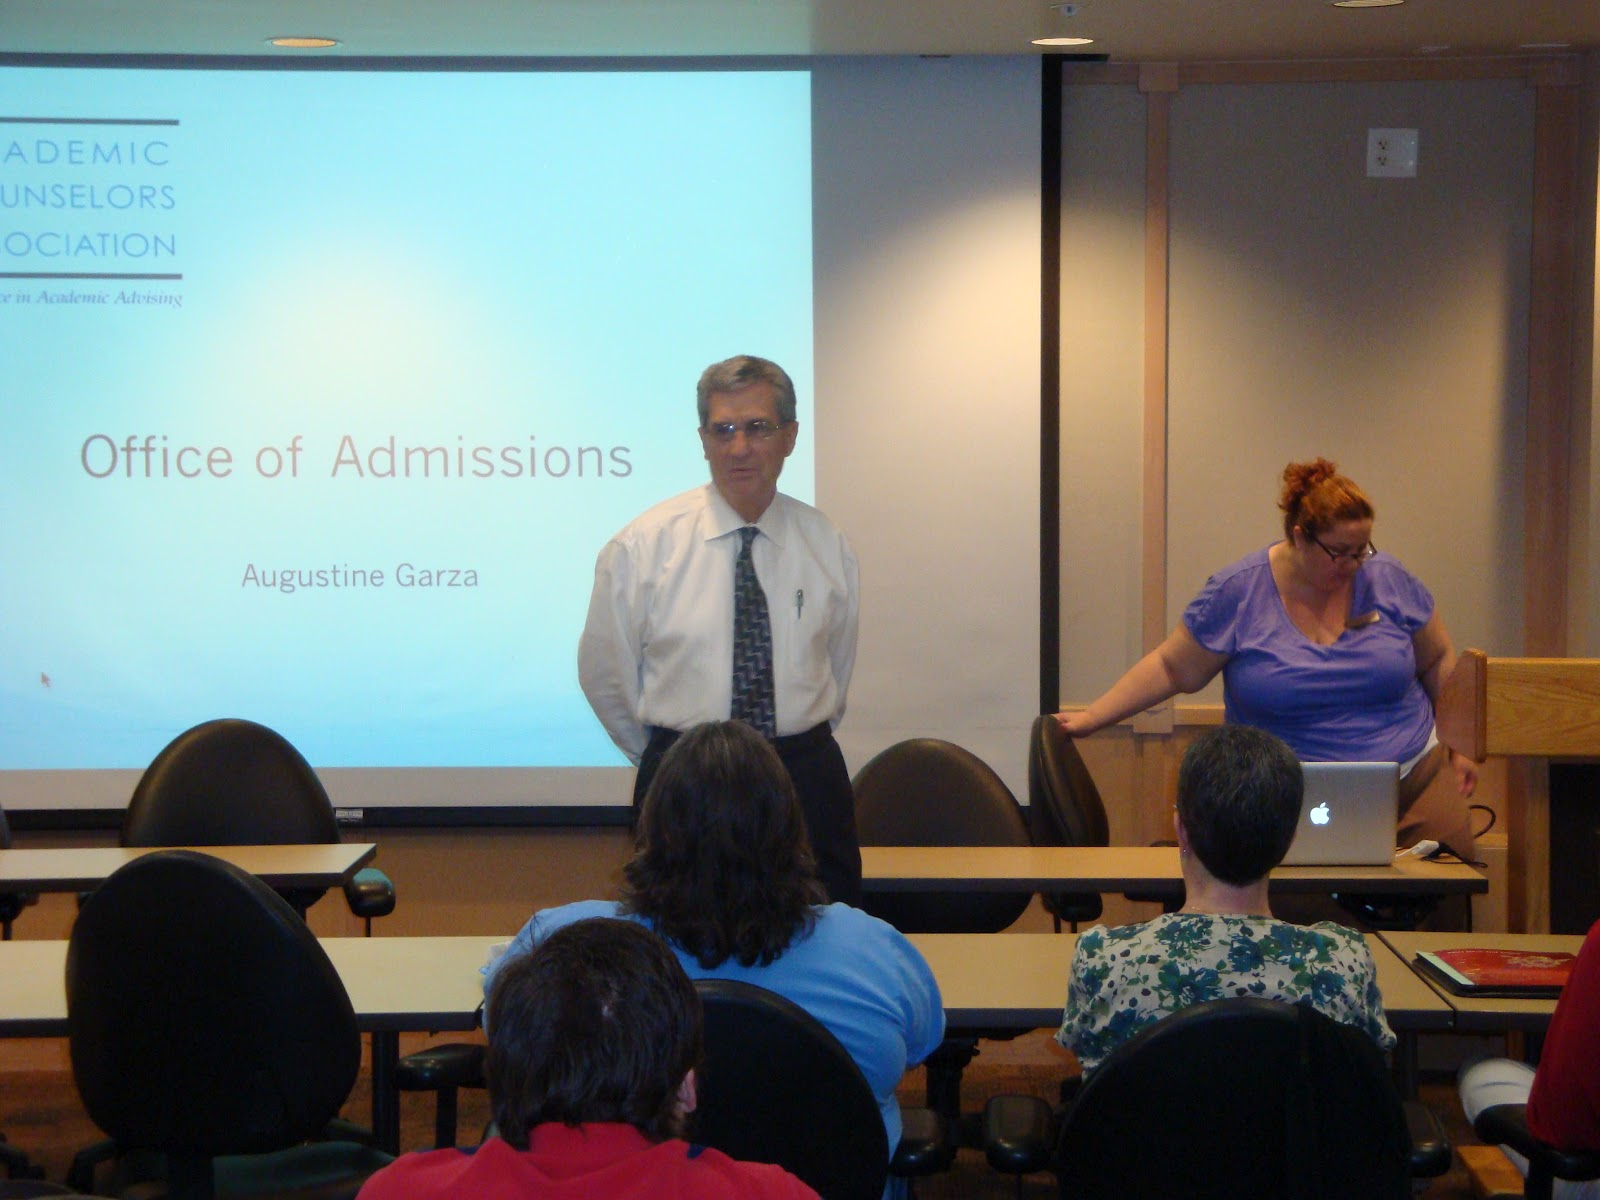 Academic advisors